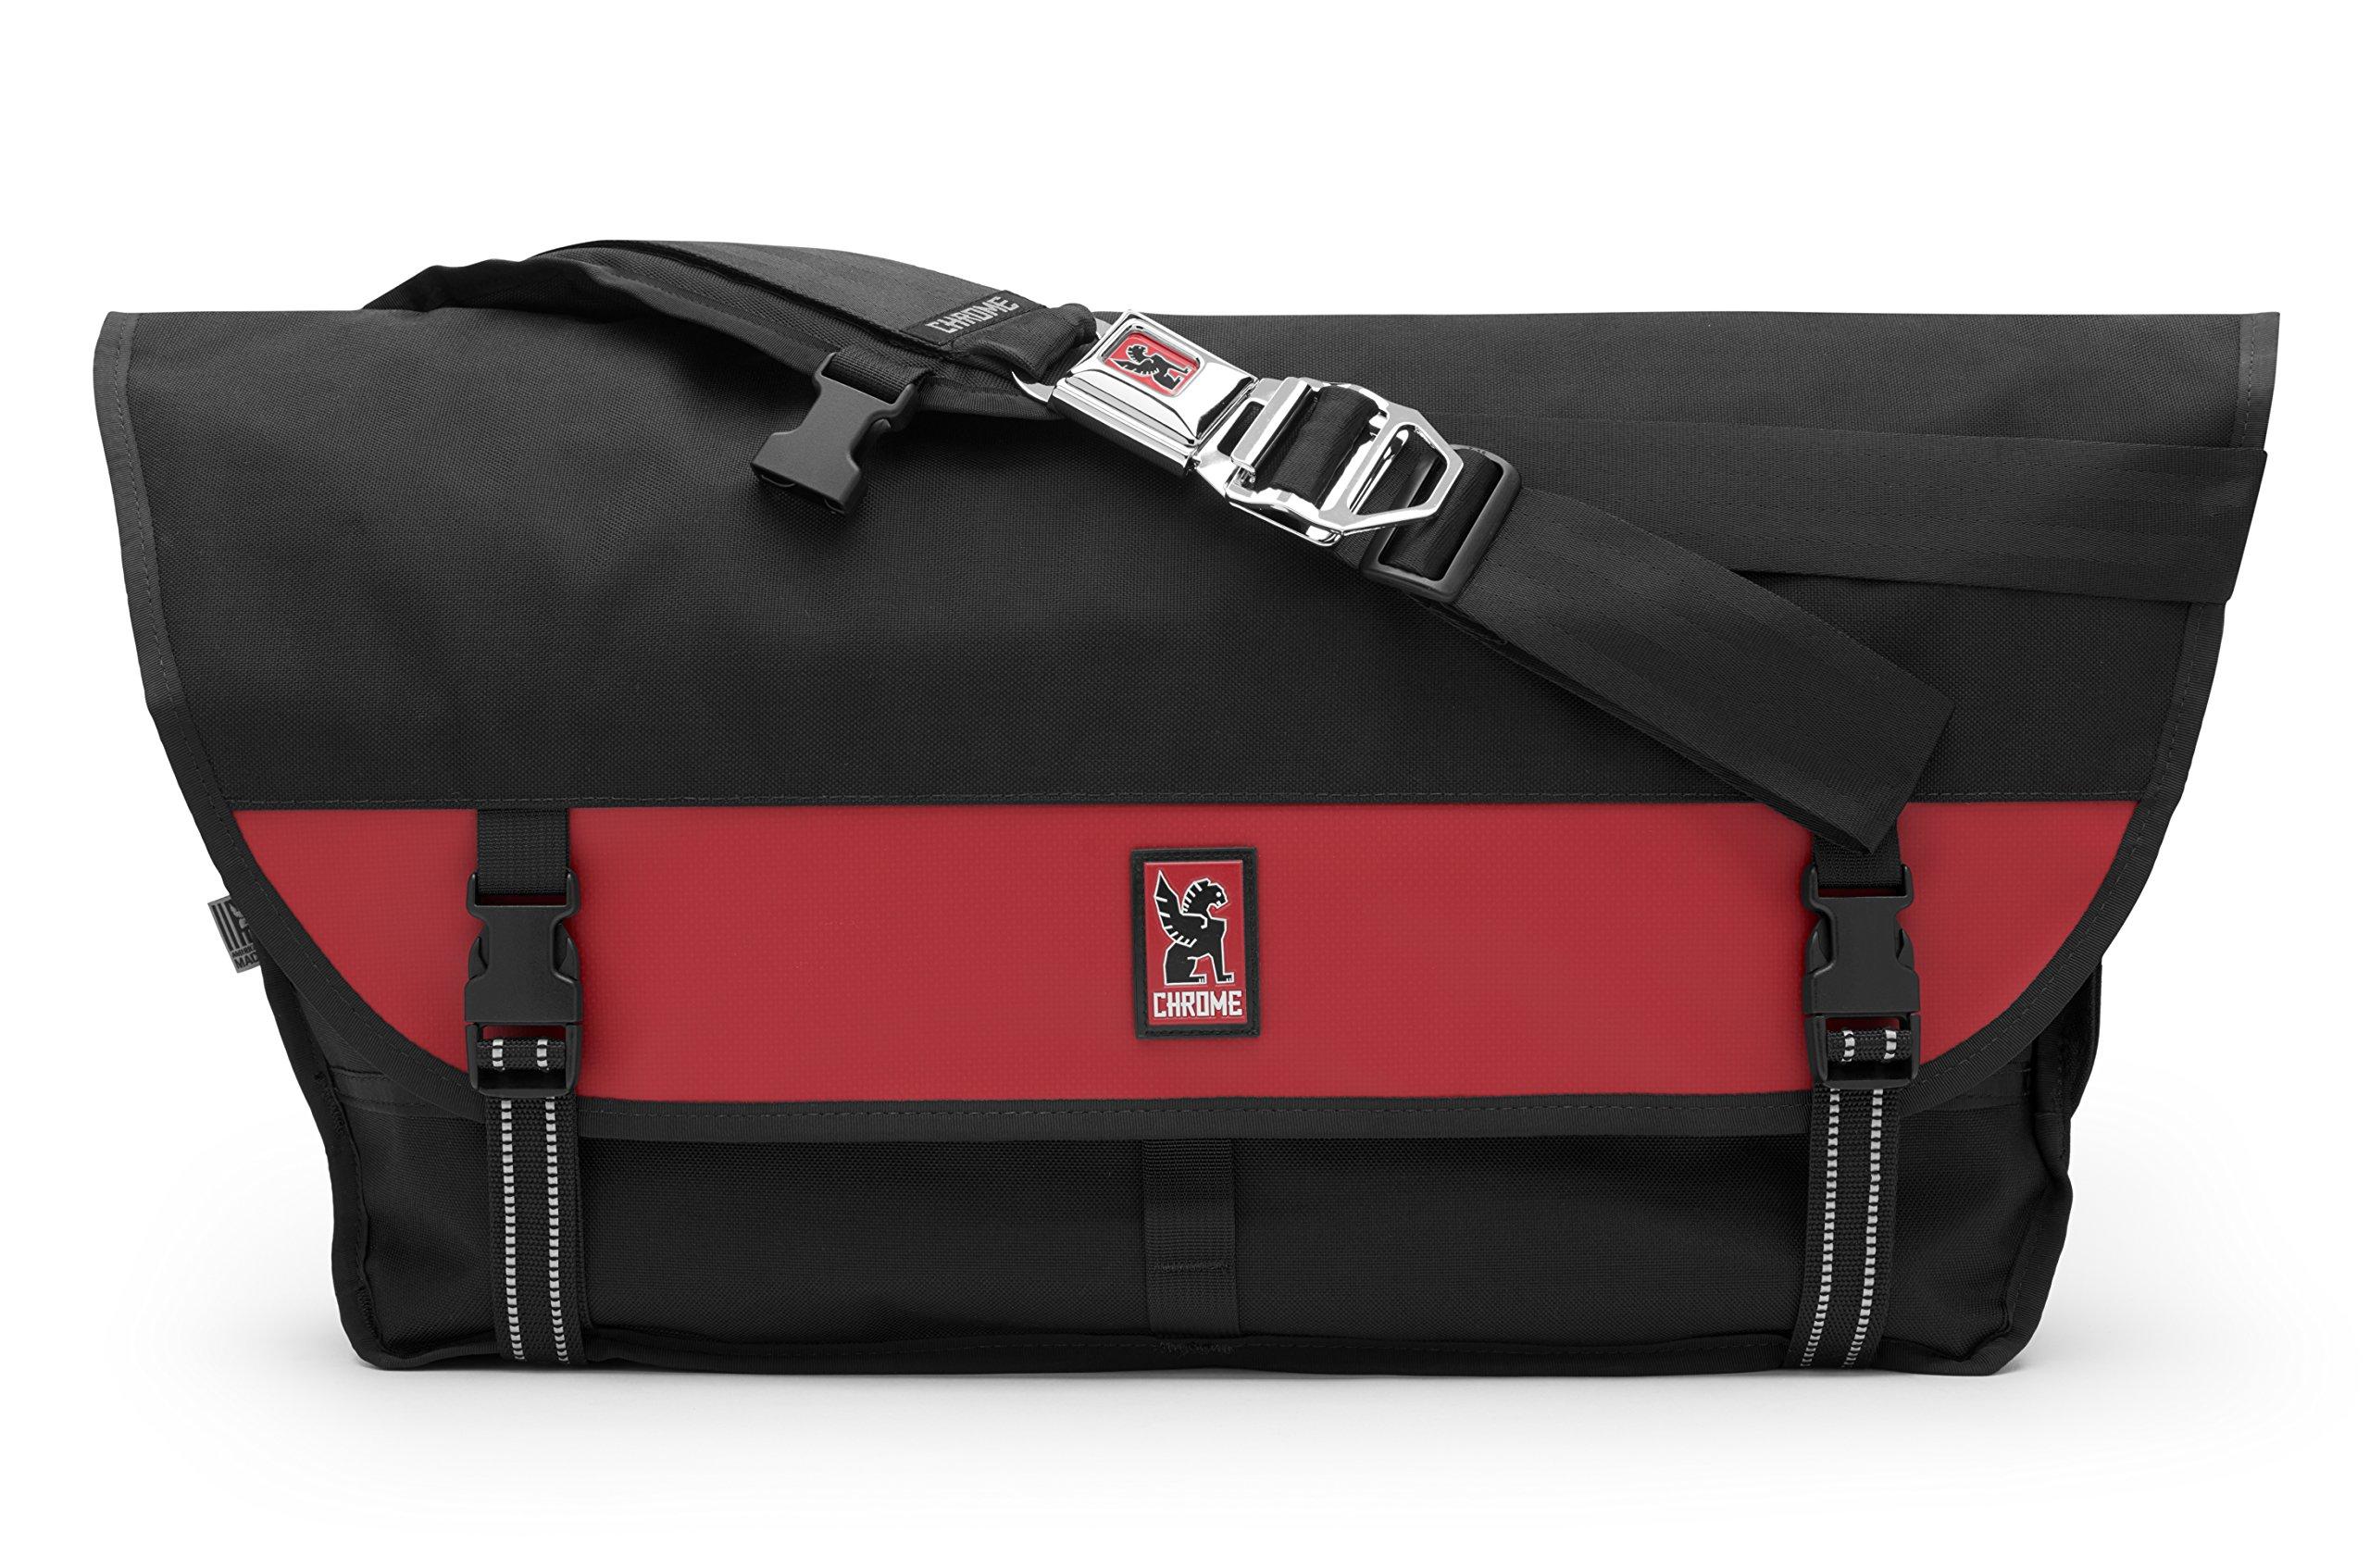 Chrome BG-003-BKRD Black/Red One Size Metropolis Messenger Bag Chrome Buckle